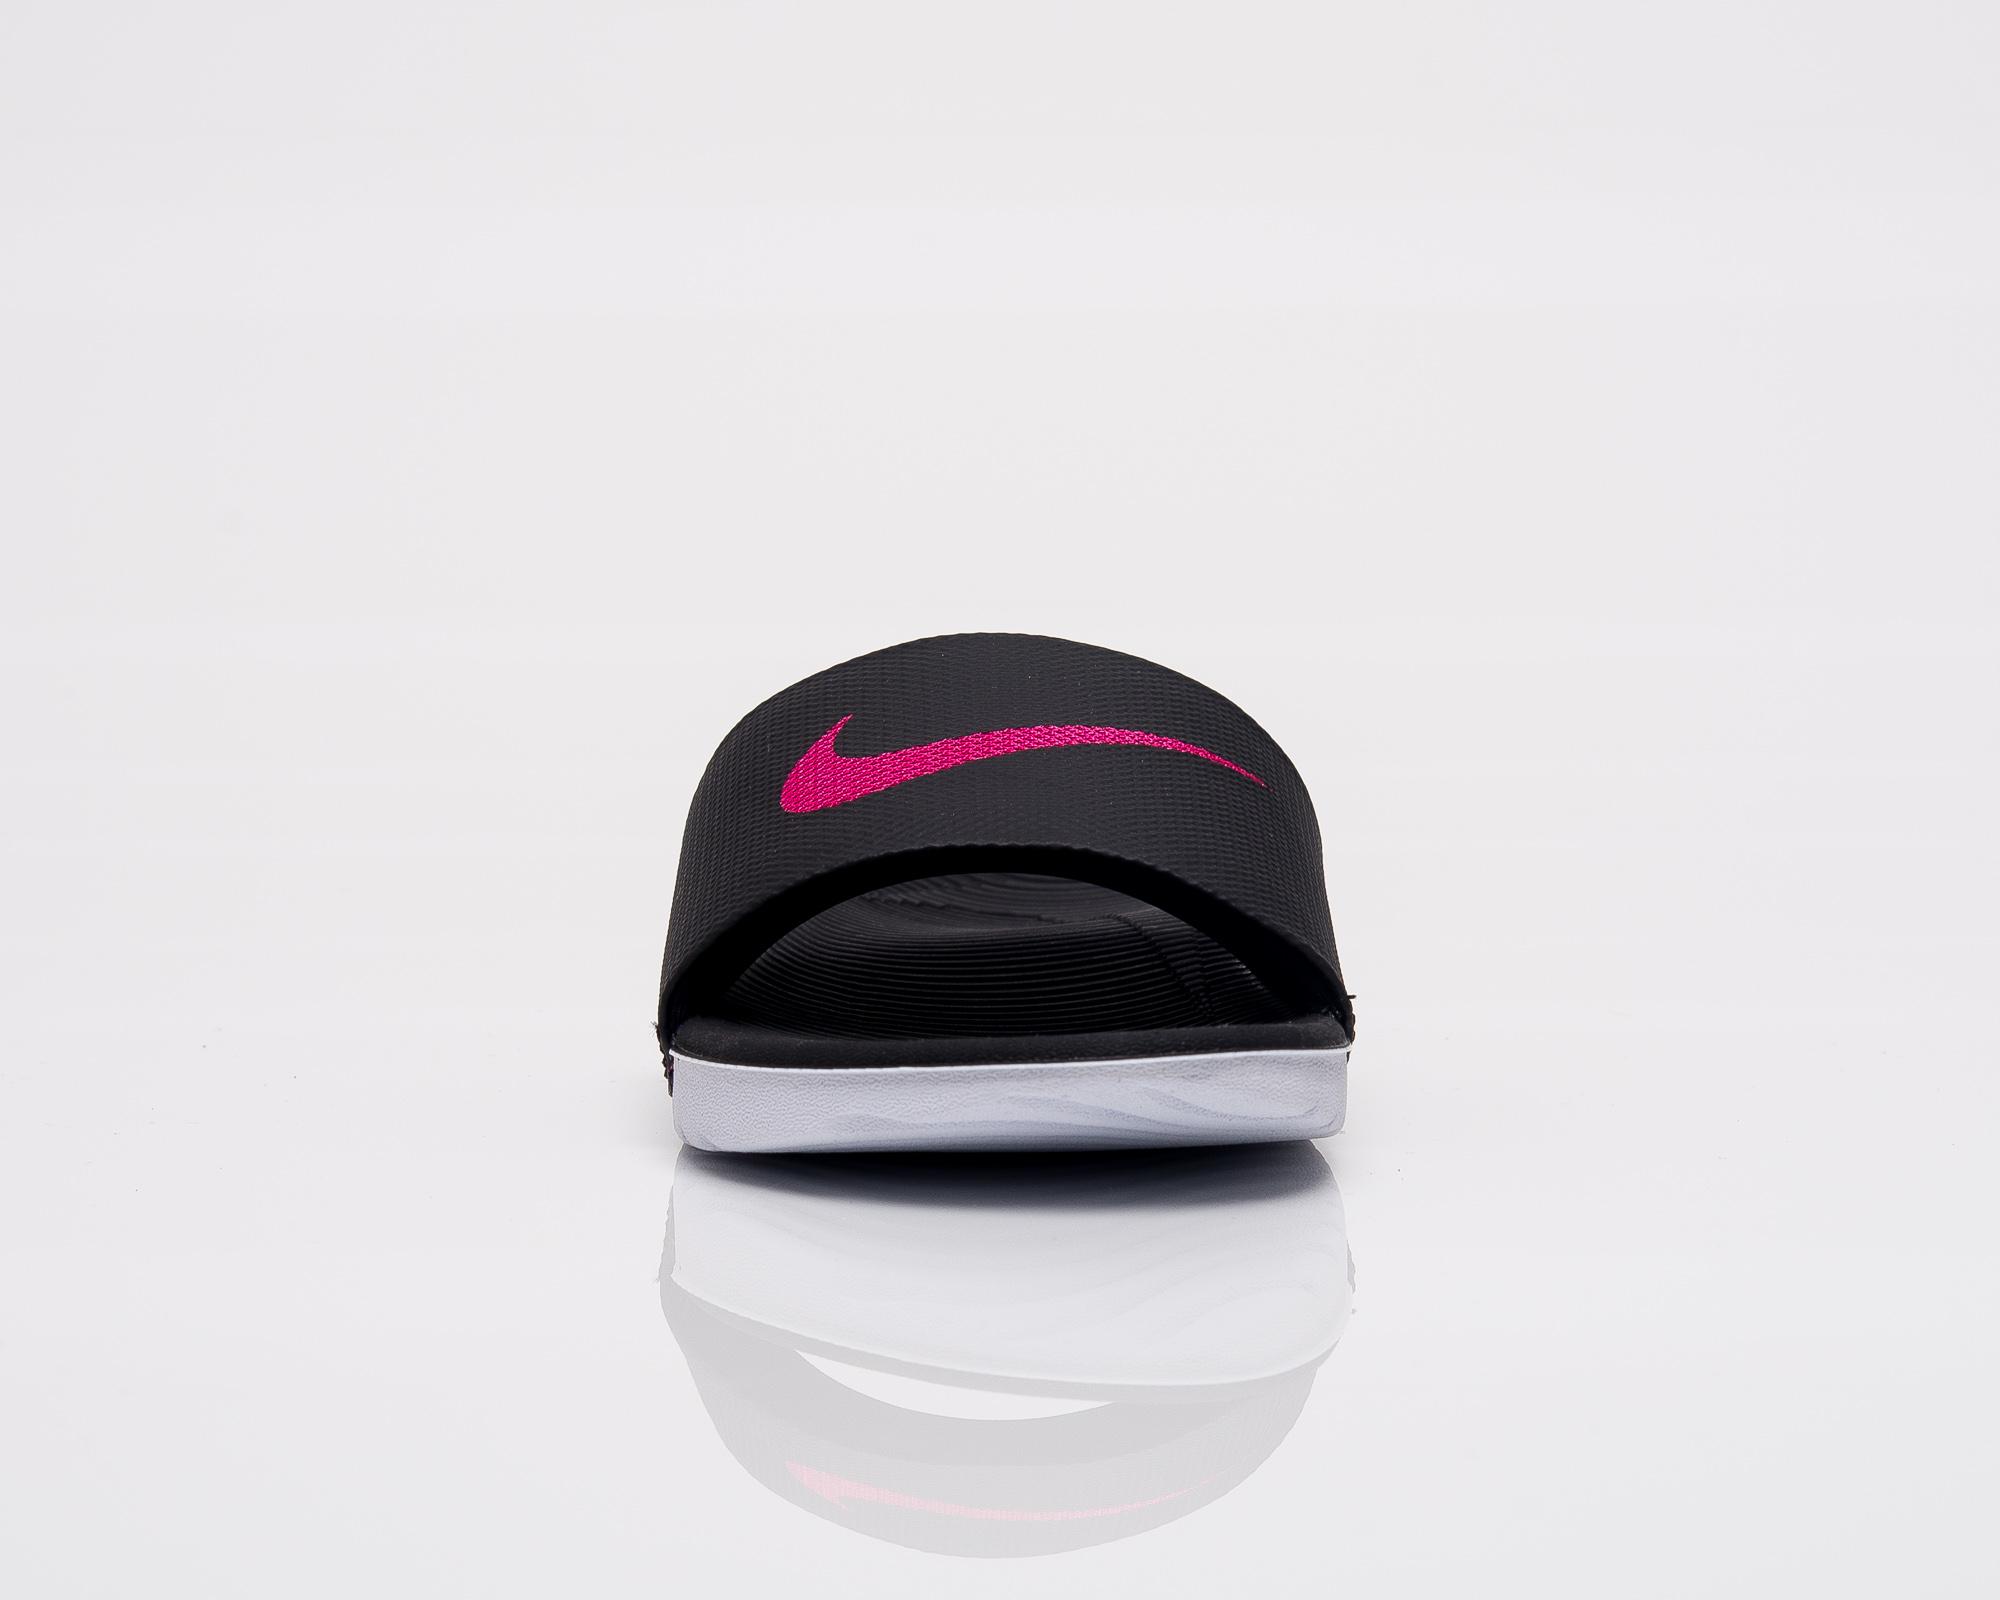 Nike Wmns Kawa Slide Shoes Slides Sporting Goods Sil Lt